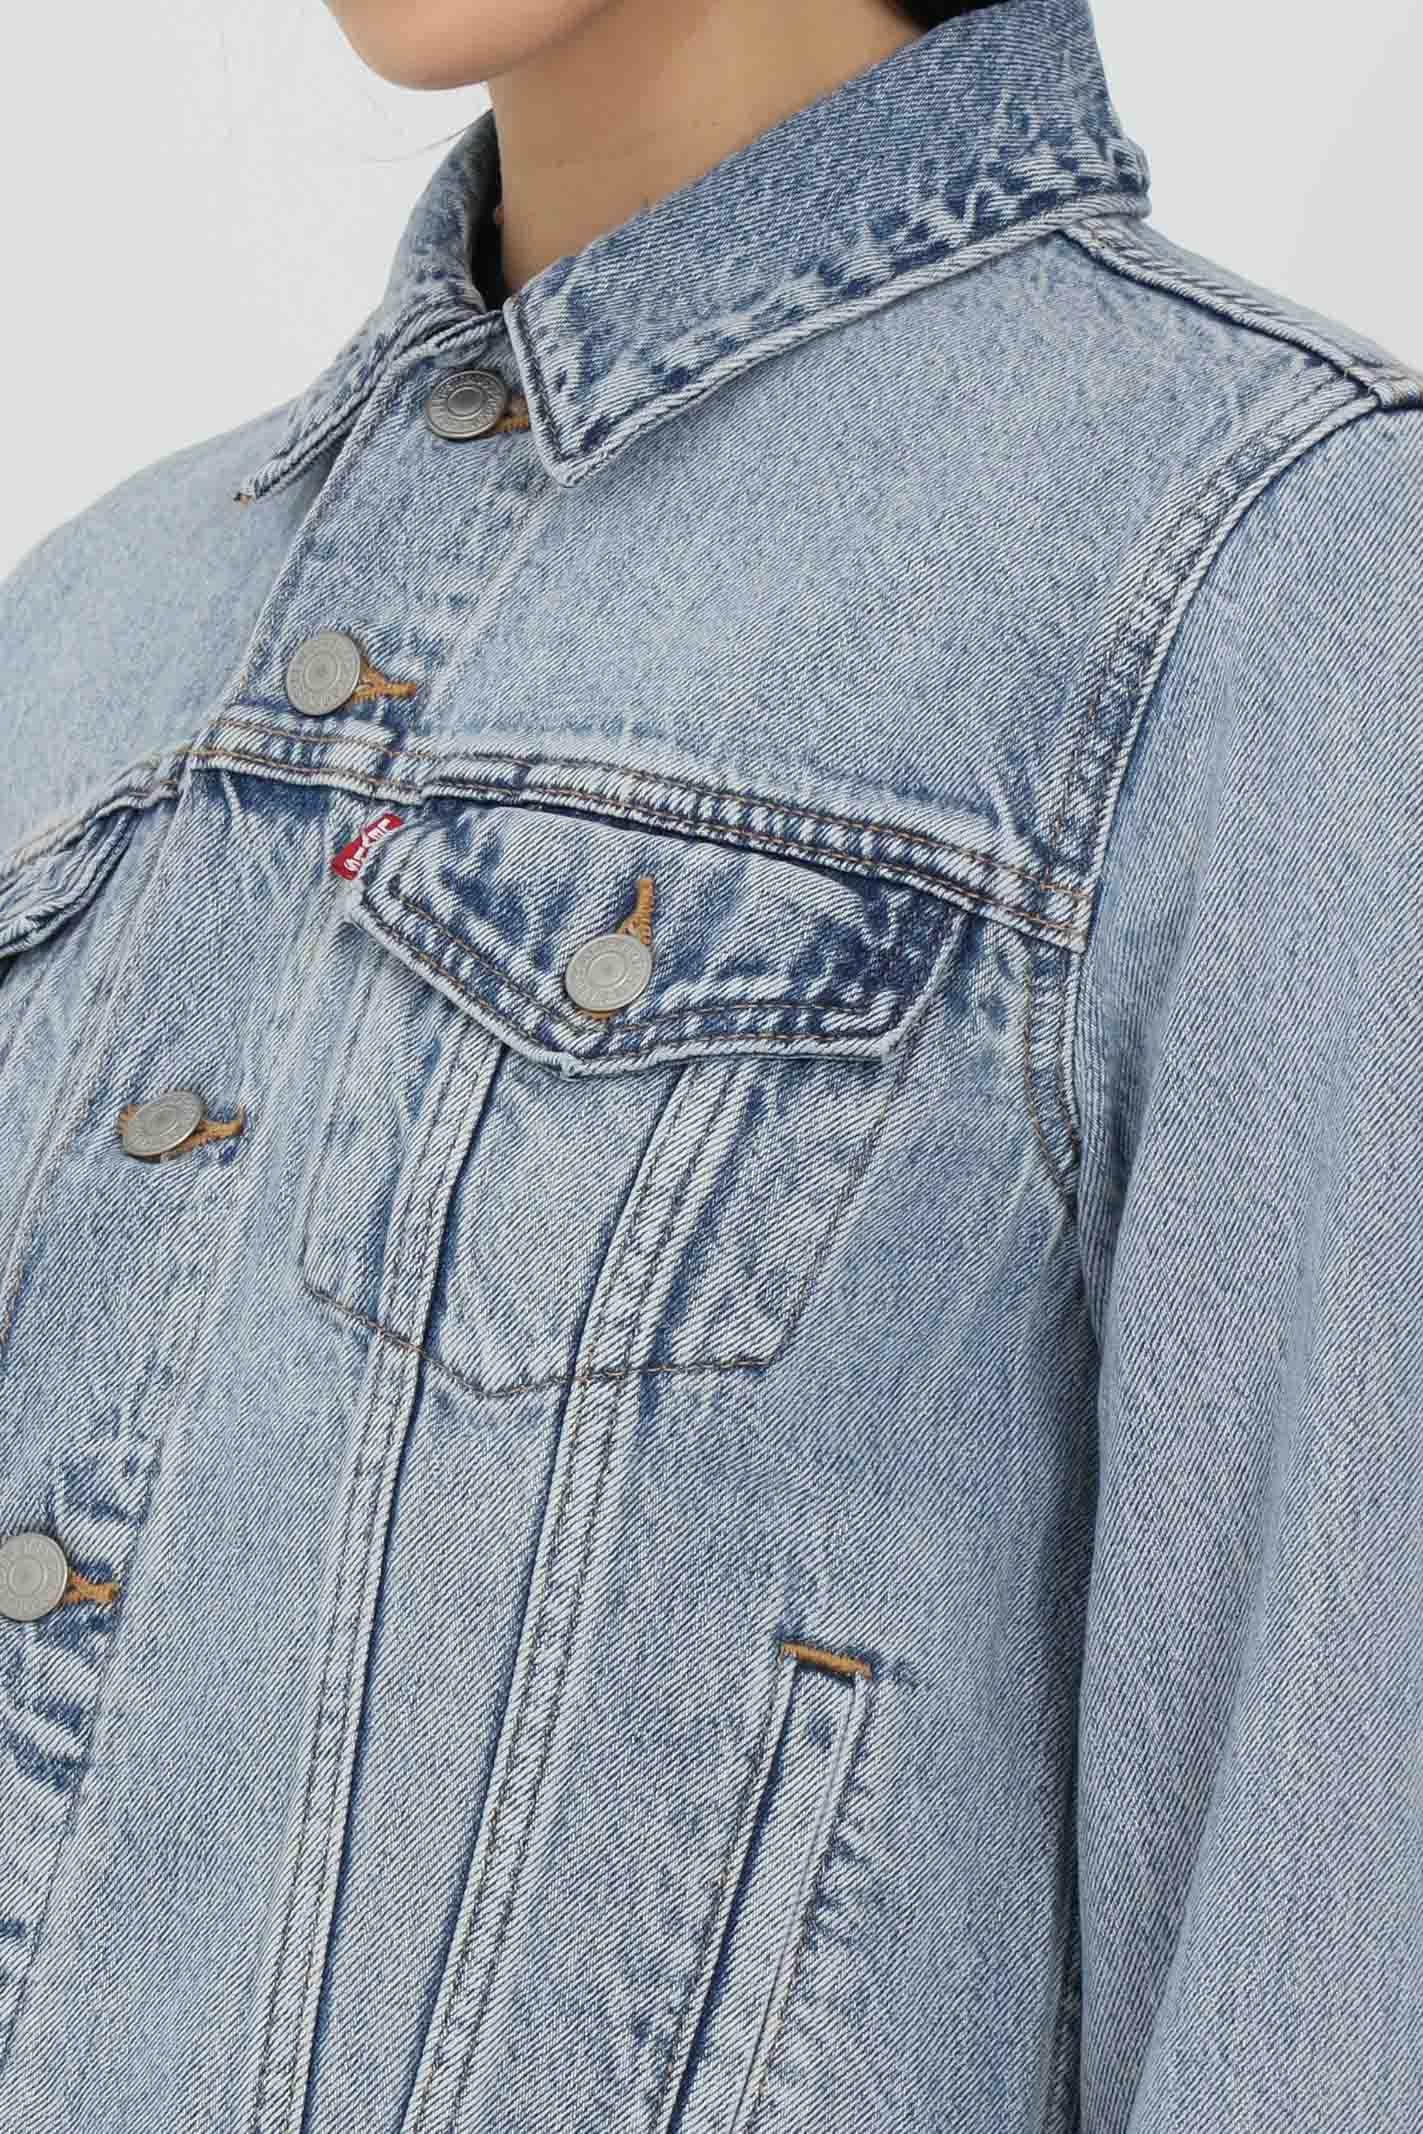 Denim jacket with buttons LEVI'S | Jacket | 29945-01000100